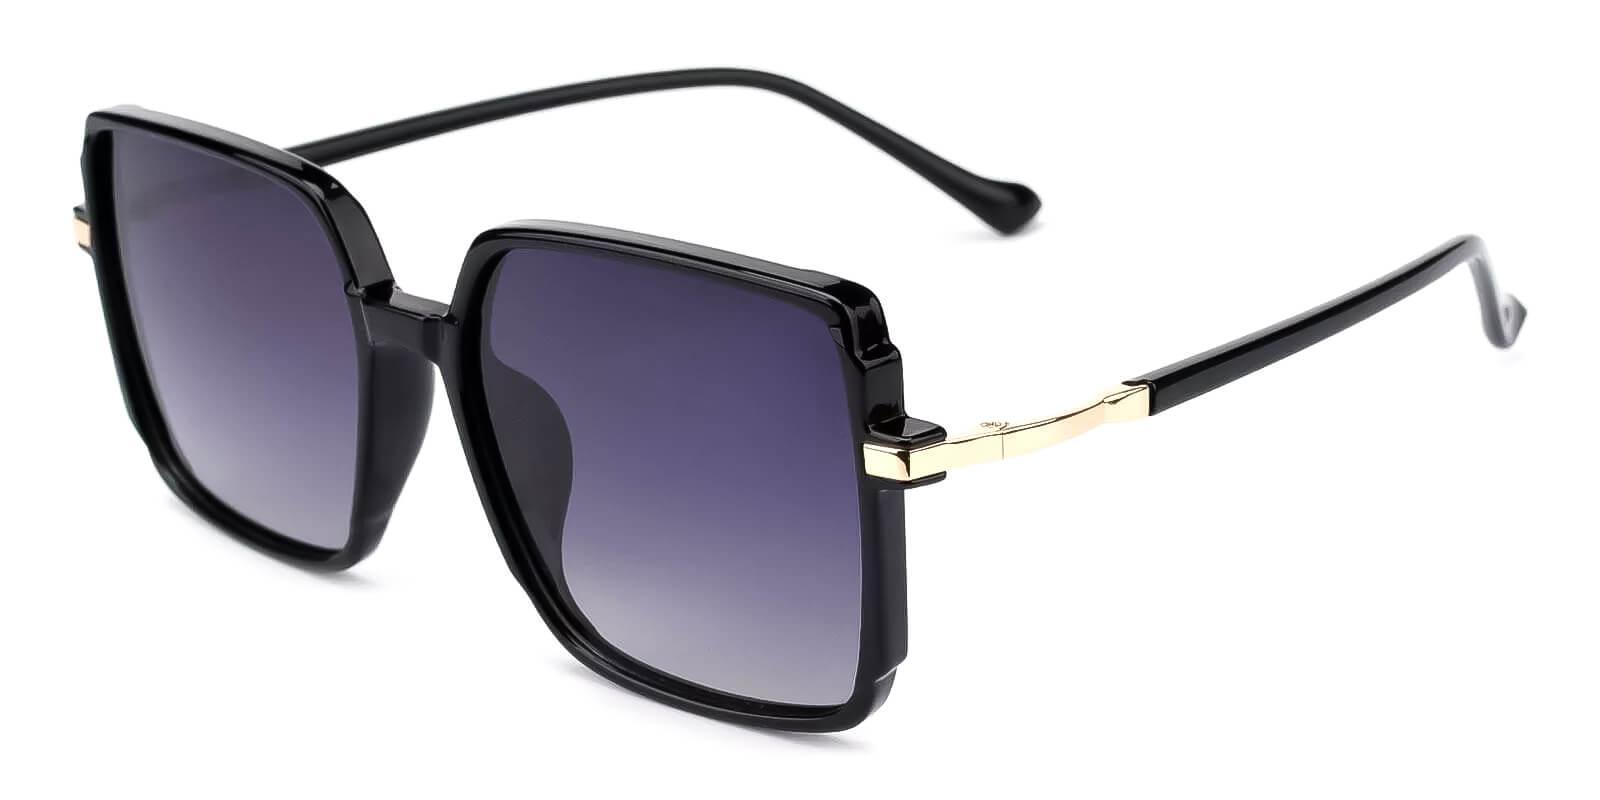 Quest Black TR Fashion , Sunglasses , UniversalBridgeFit Frames from ABBE Glasses